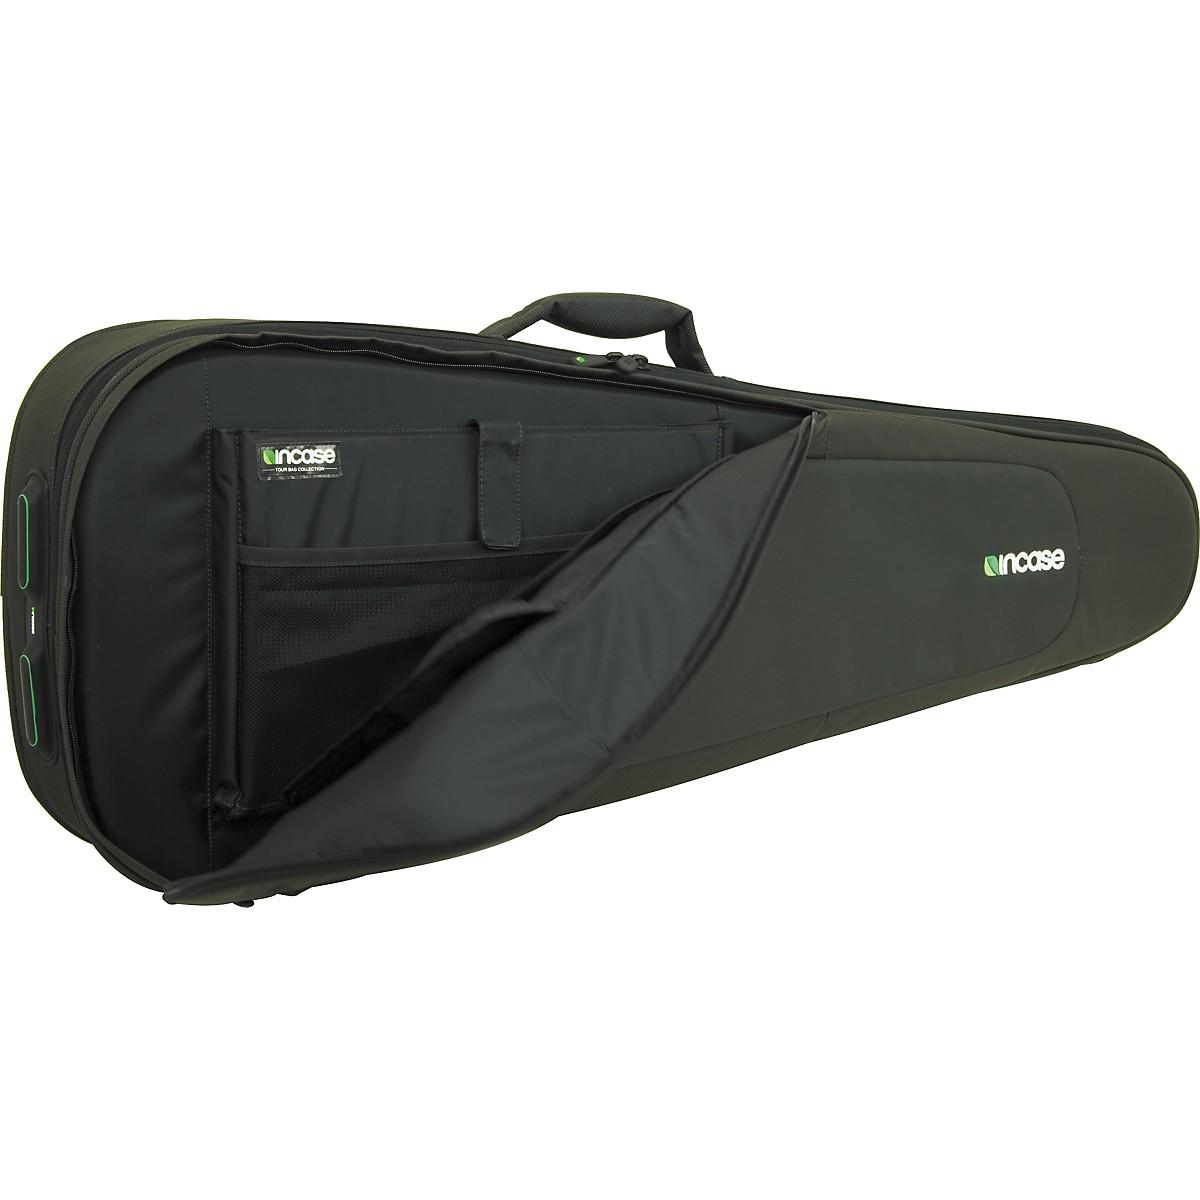 Incase Guitar Tour Bag